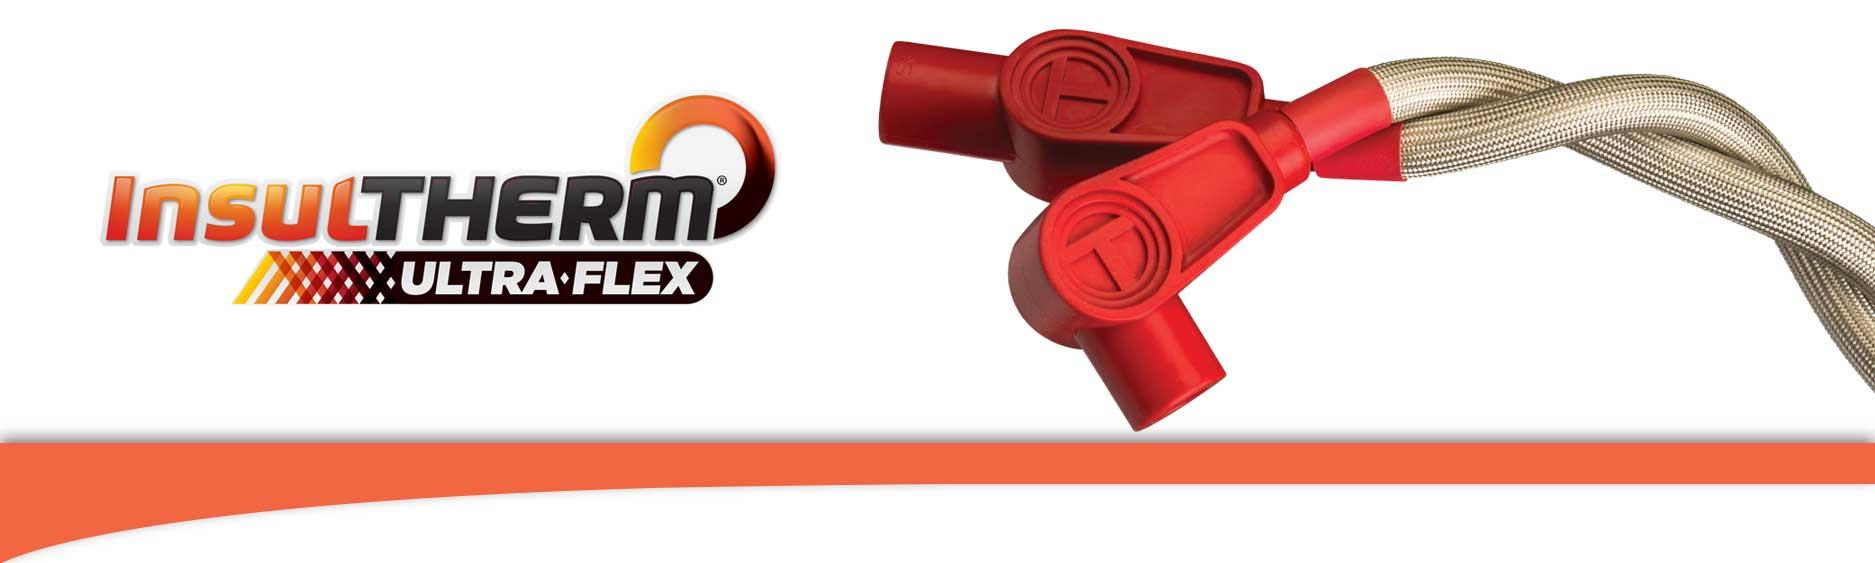 Insultherm Ultraflex Banner